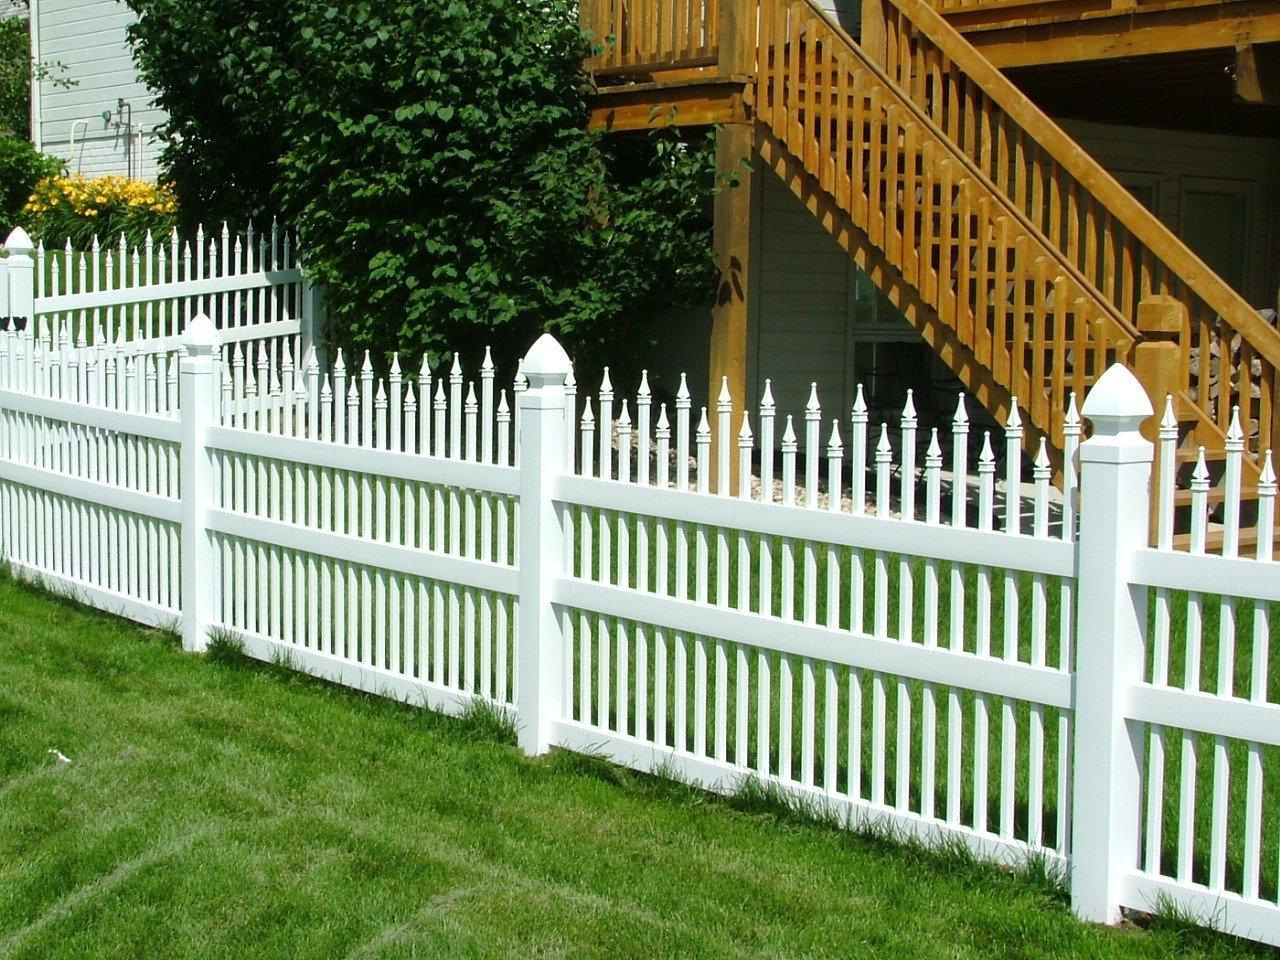 Dakota Fence & Deck 4' white pvc ornamental style - Omaha and Papillion, Nebraska